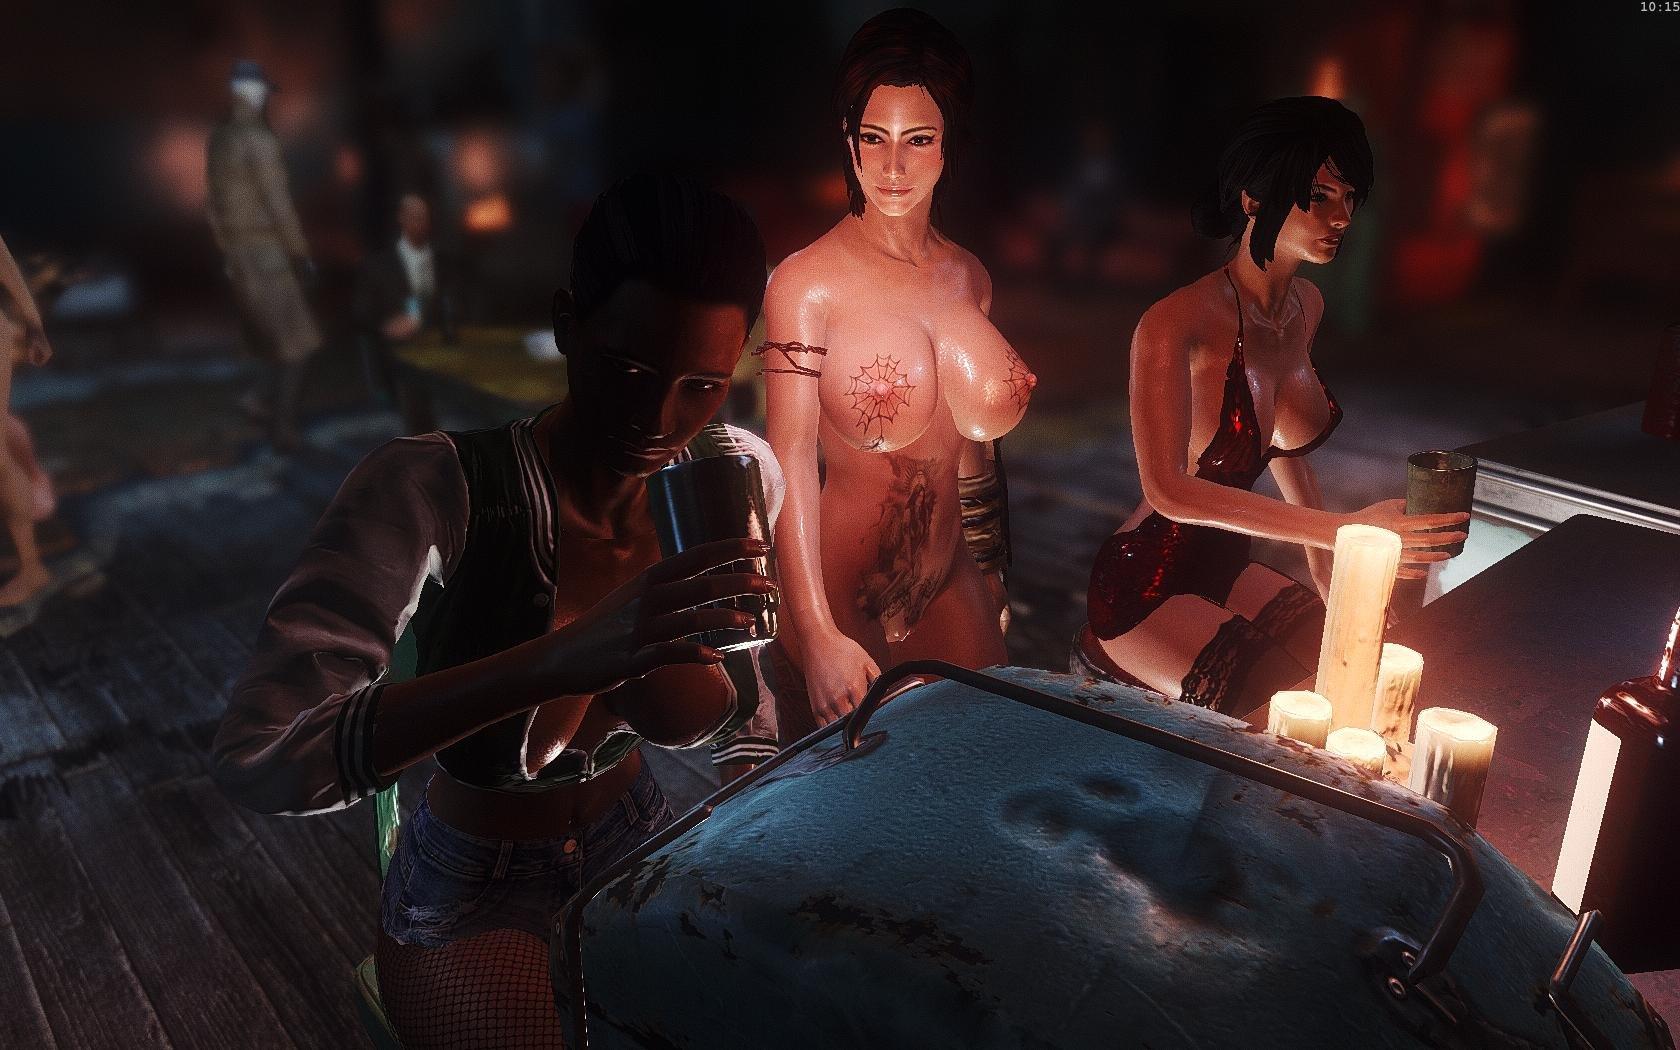 Fallout4 2019-03-25 10-15-48-04